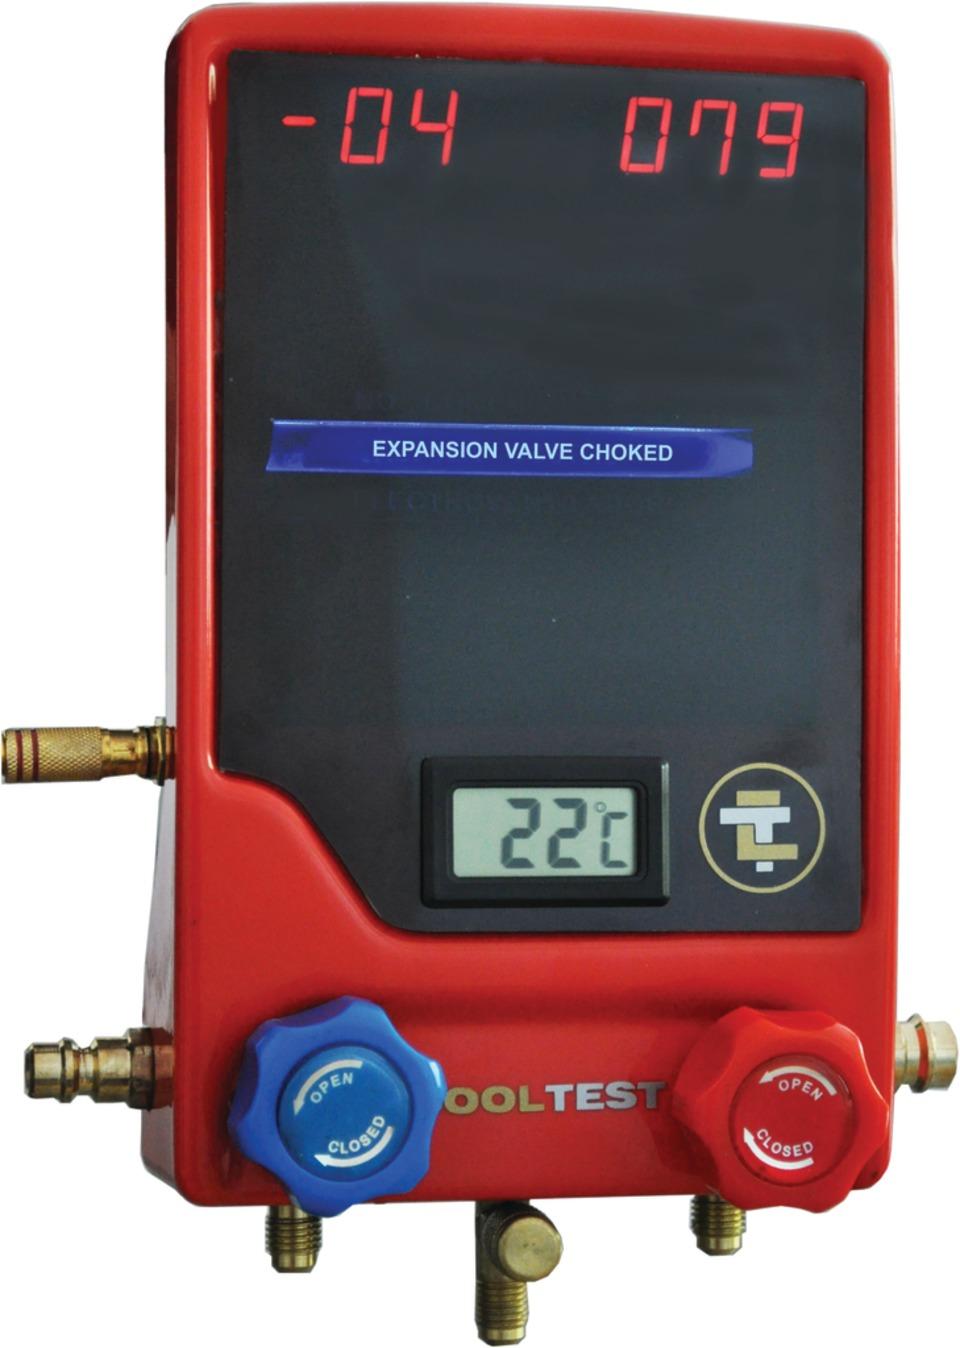 Supercool Cooltest Ac Diagnostic Tool In Diagnostic Test Equipment